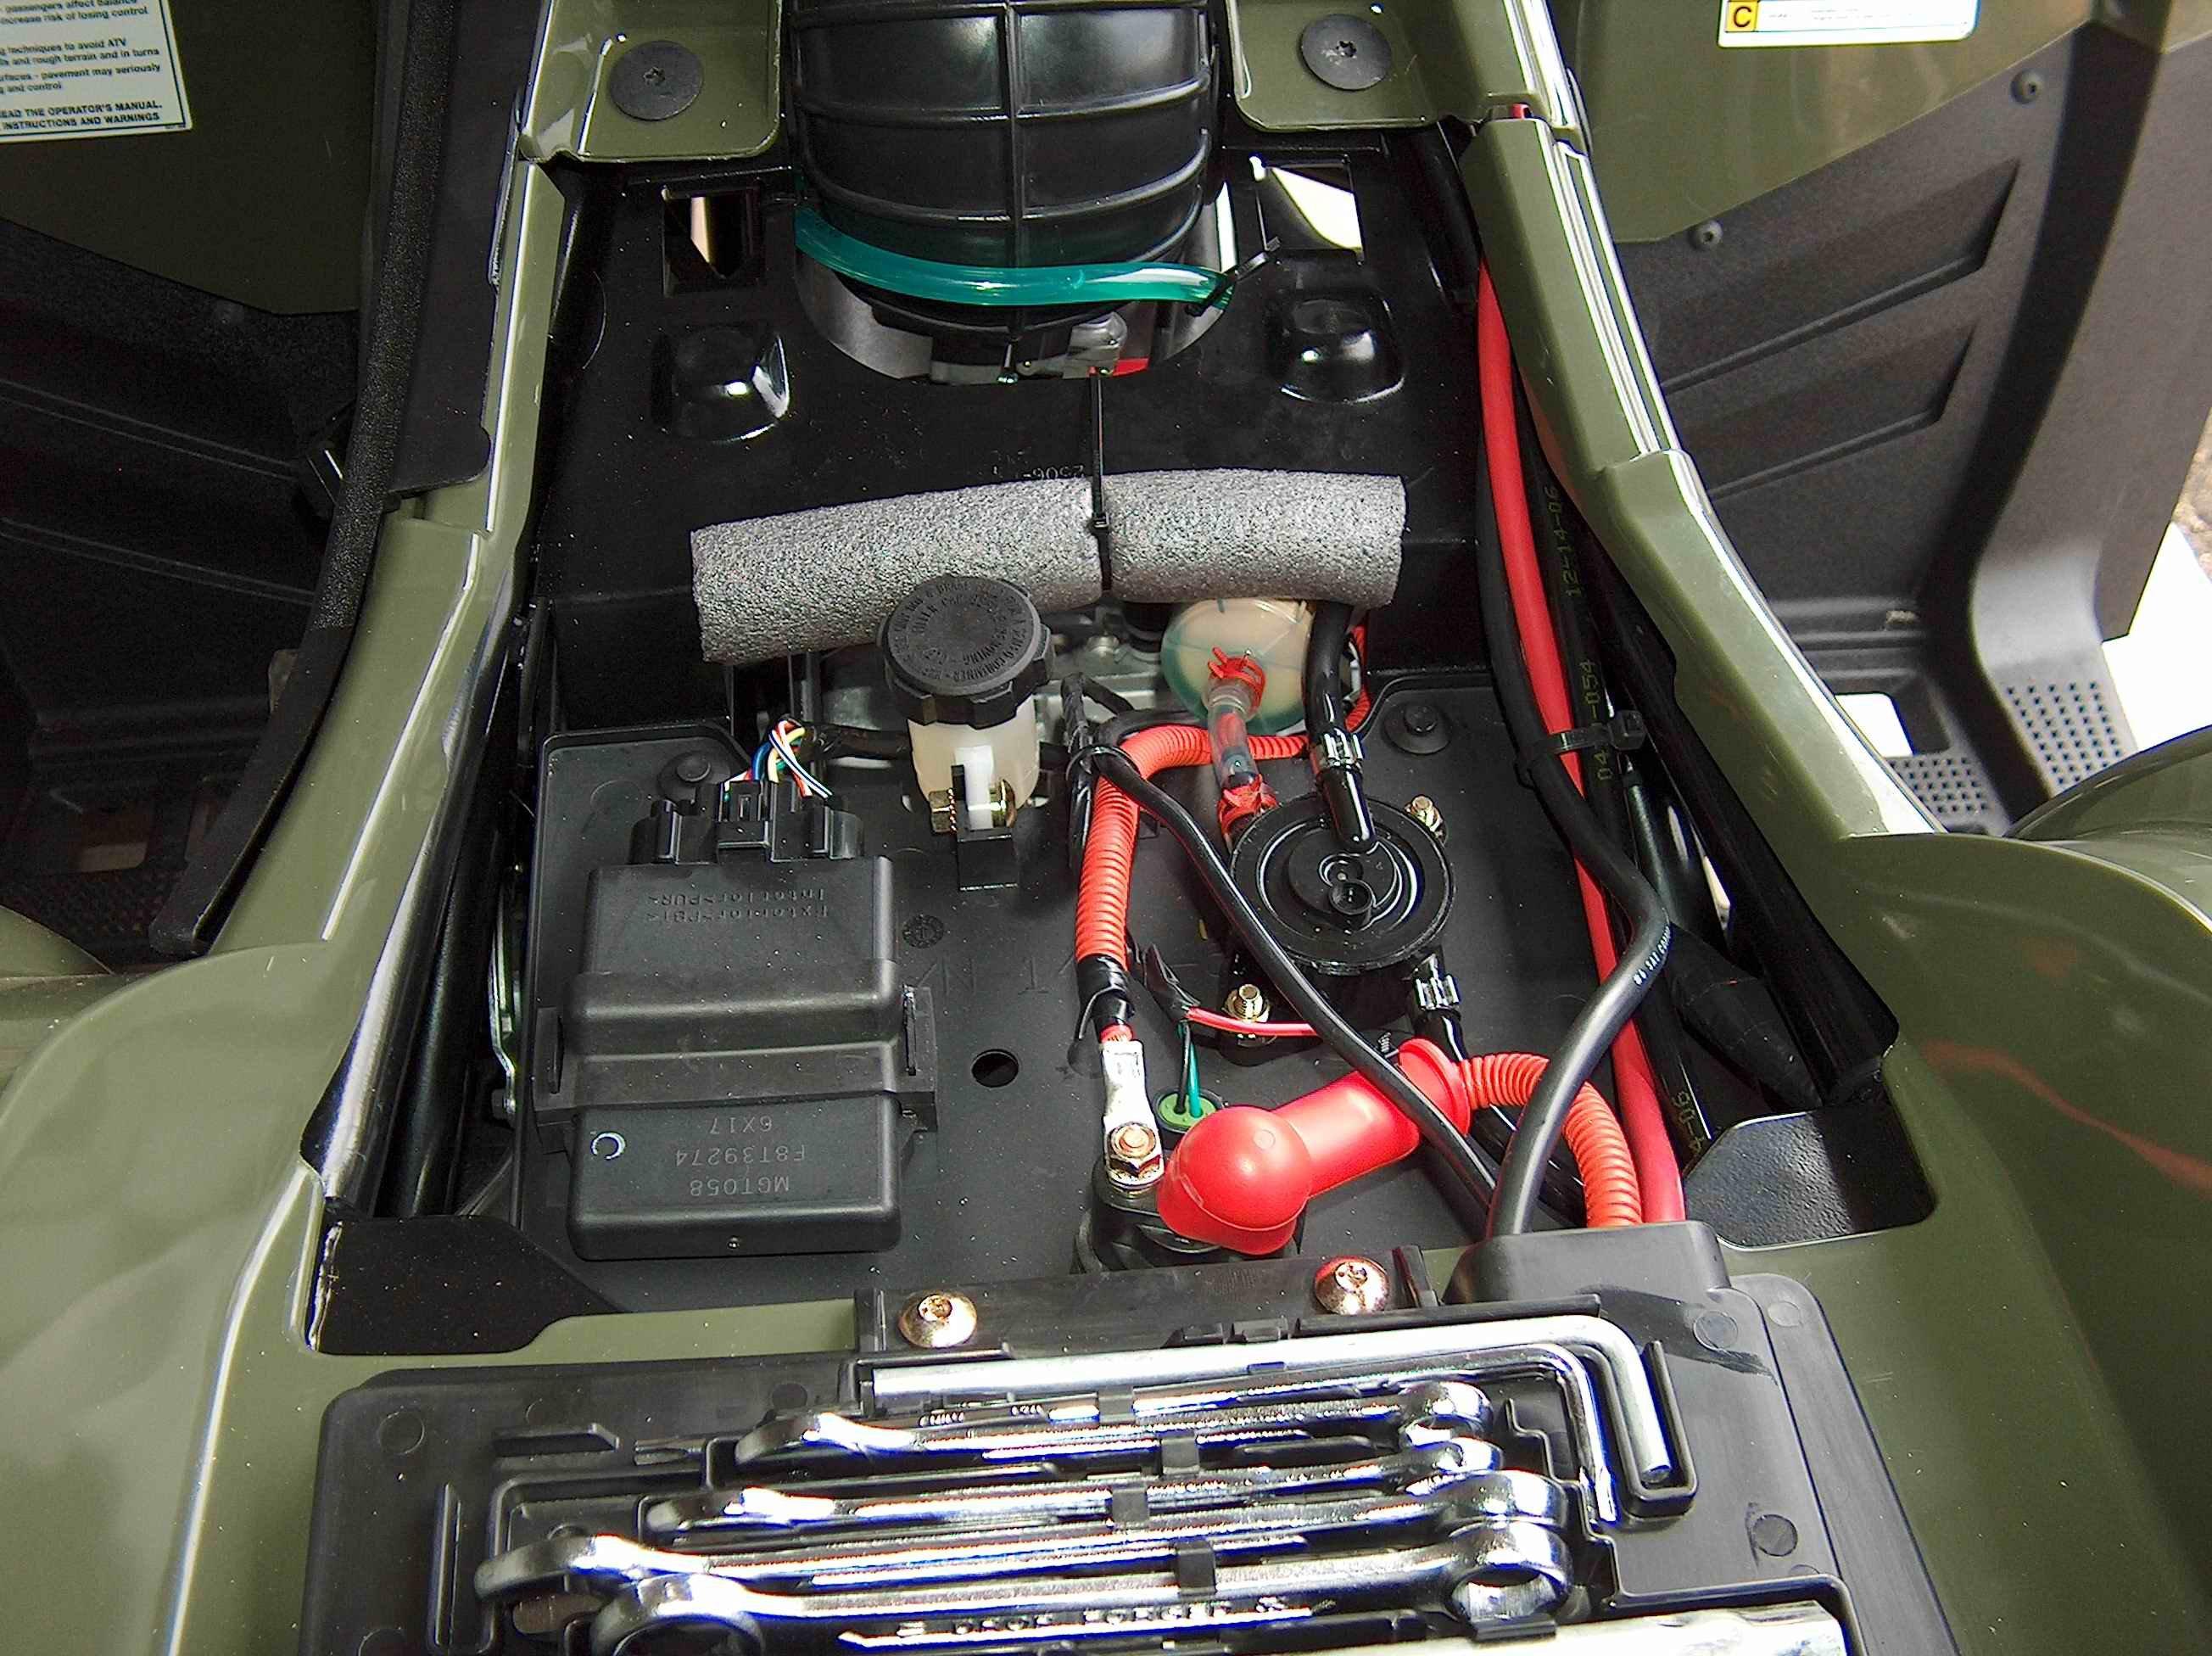 image of fuse box on arctic cat 700